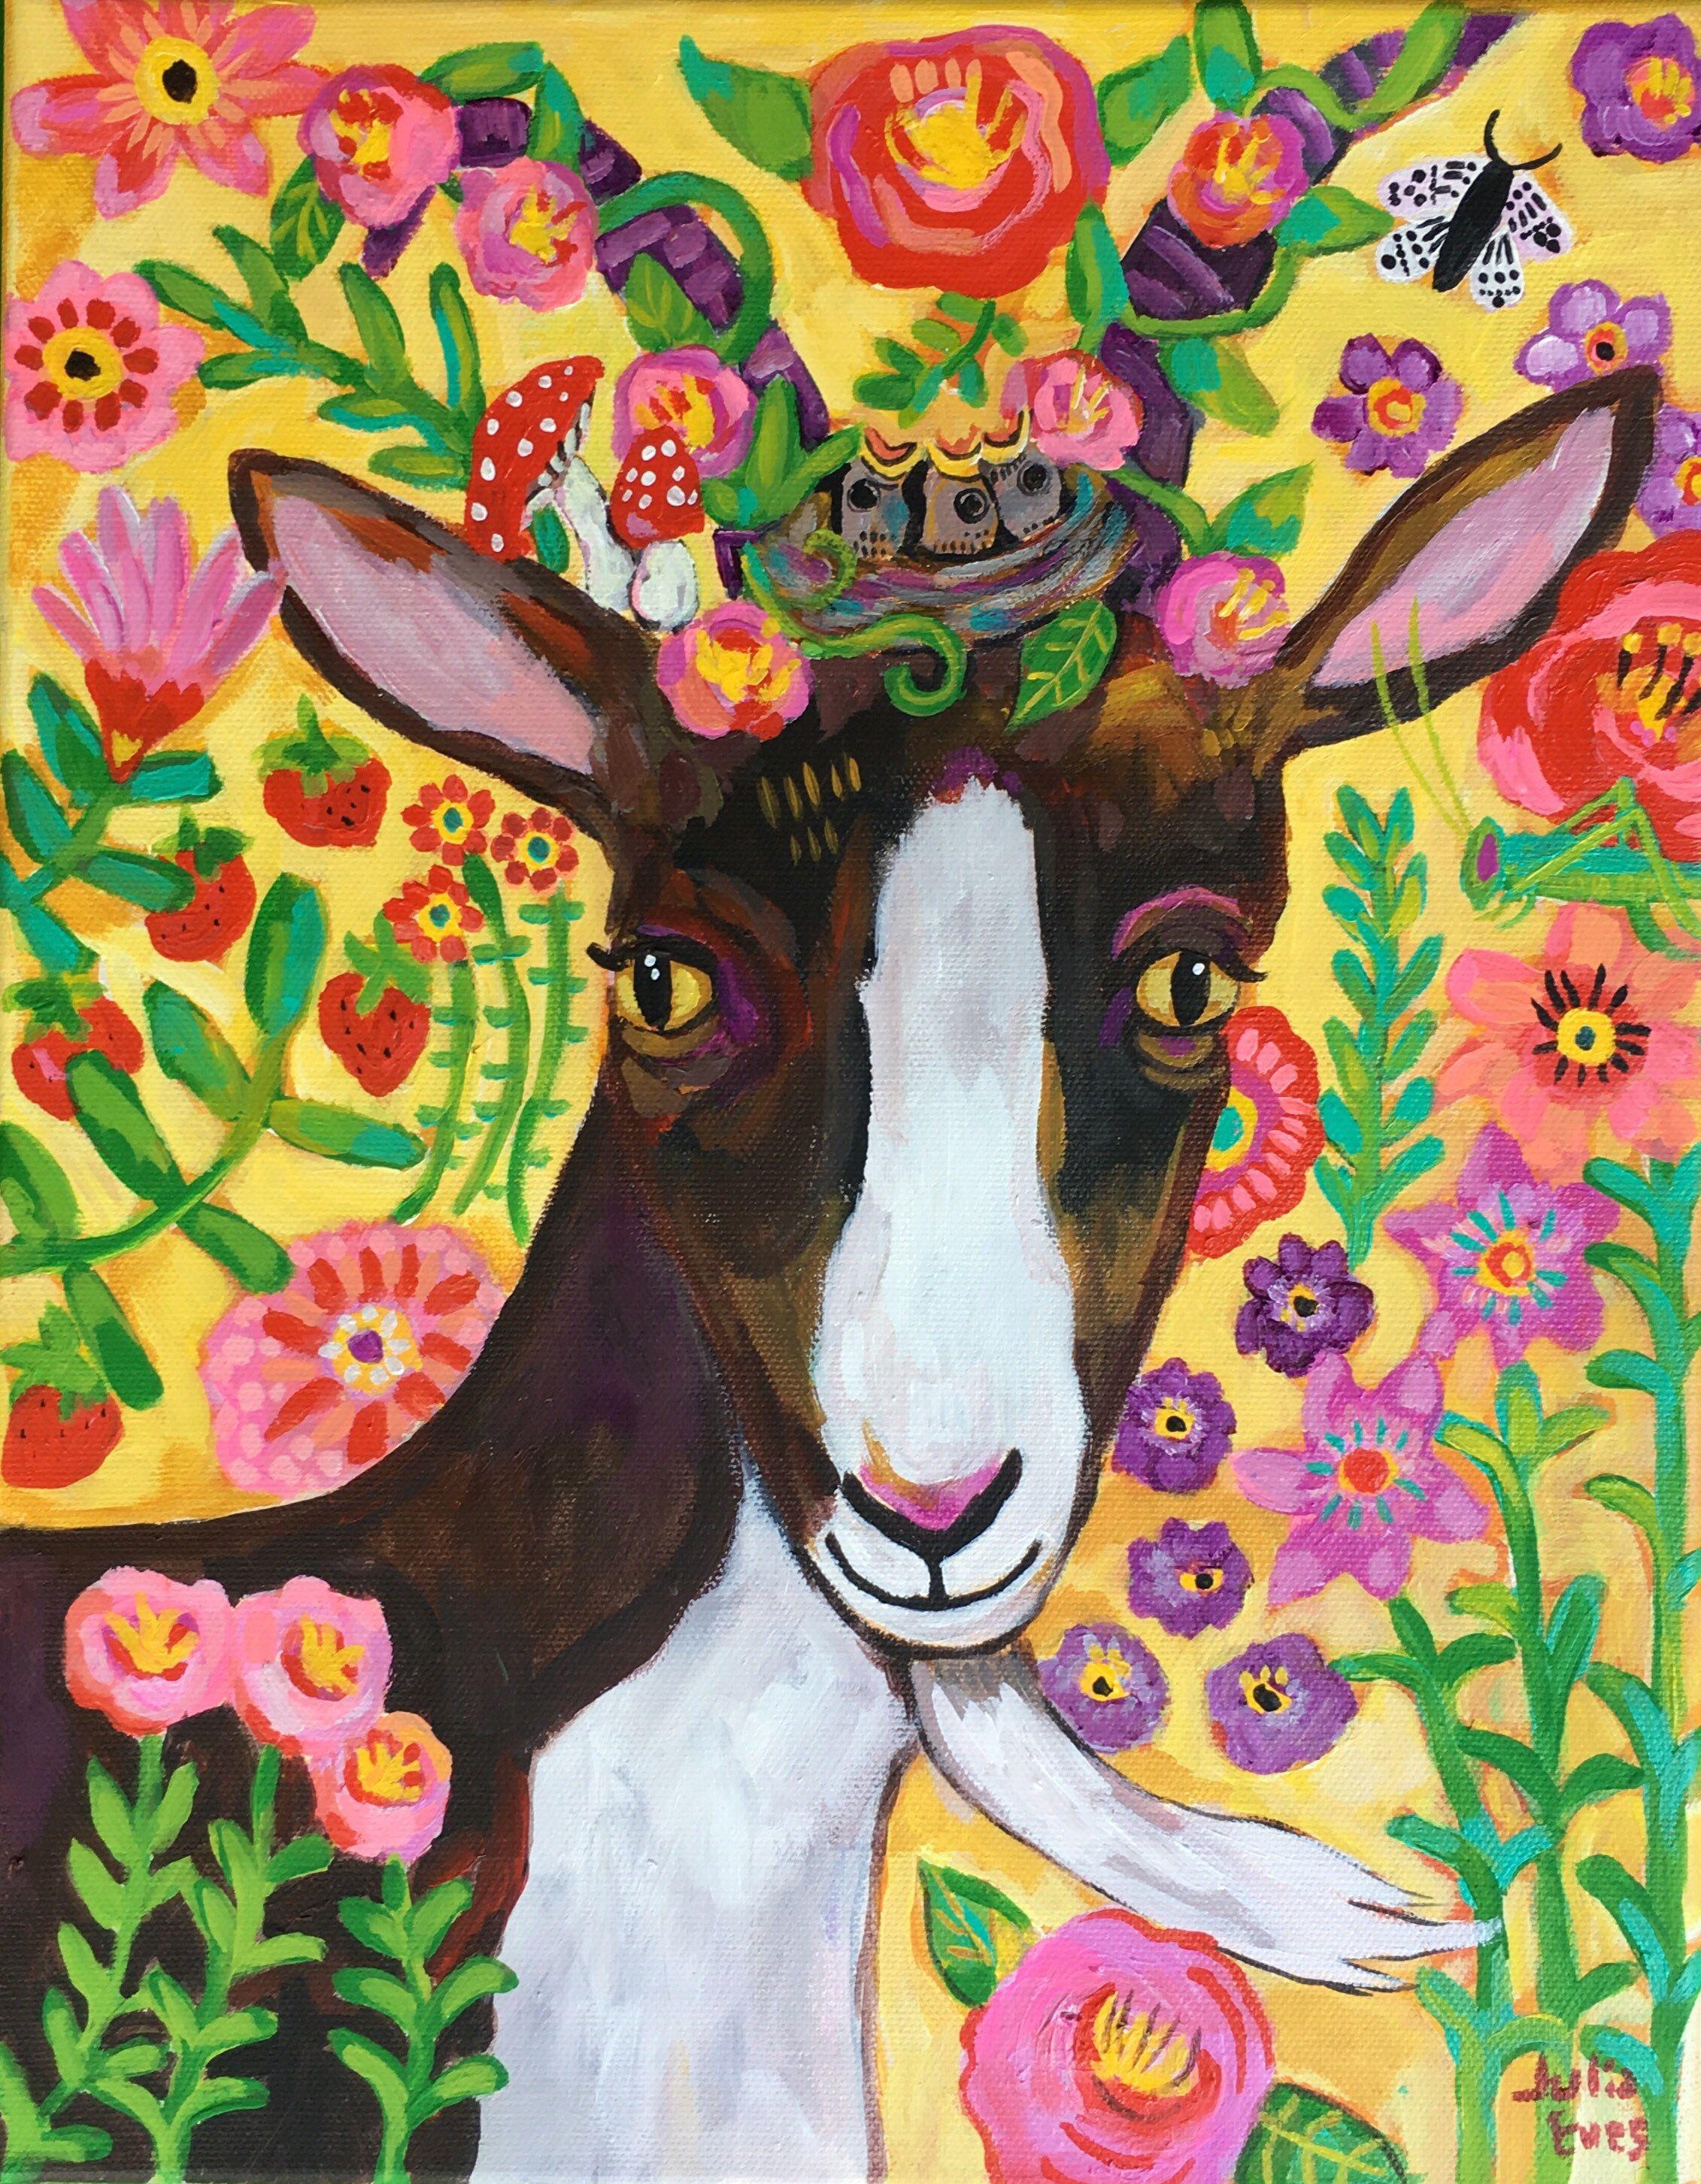 5D Diamond Painting Abstract Flower Goat Kit